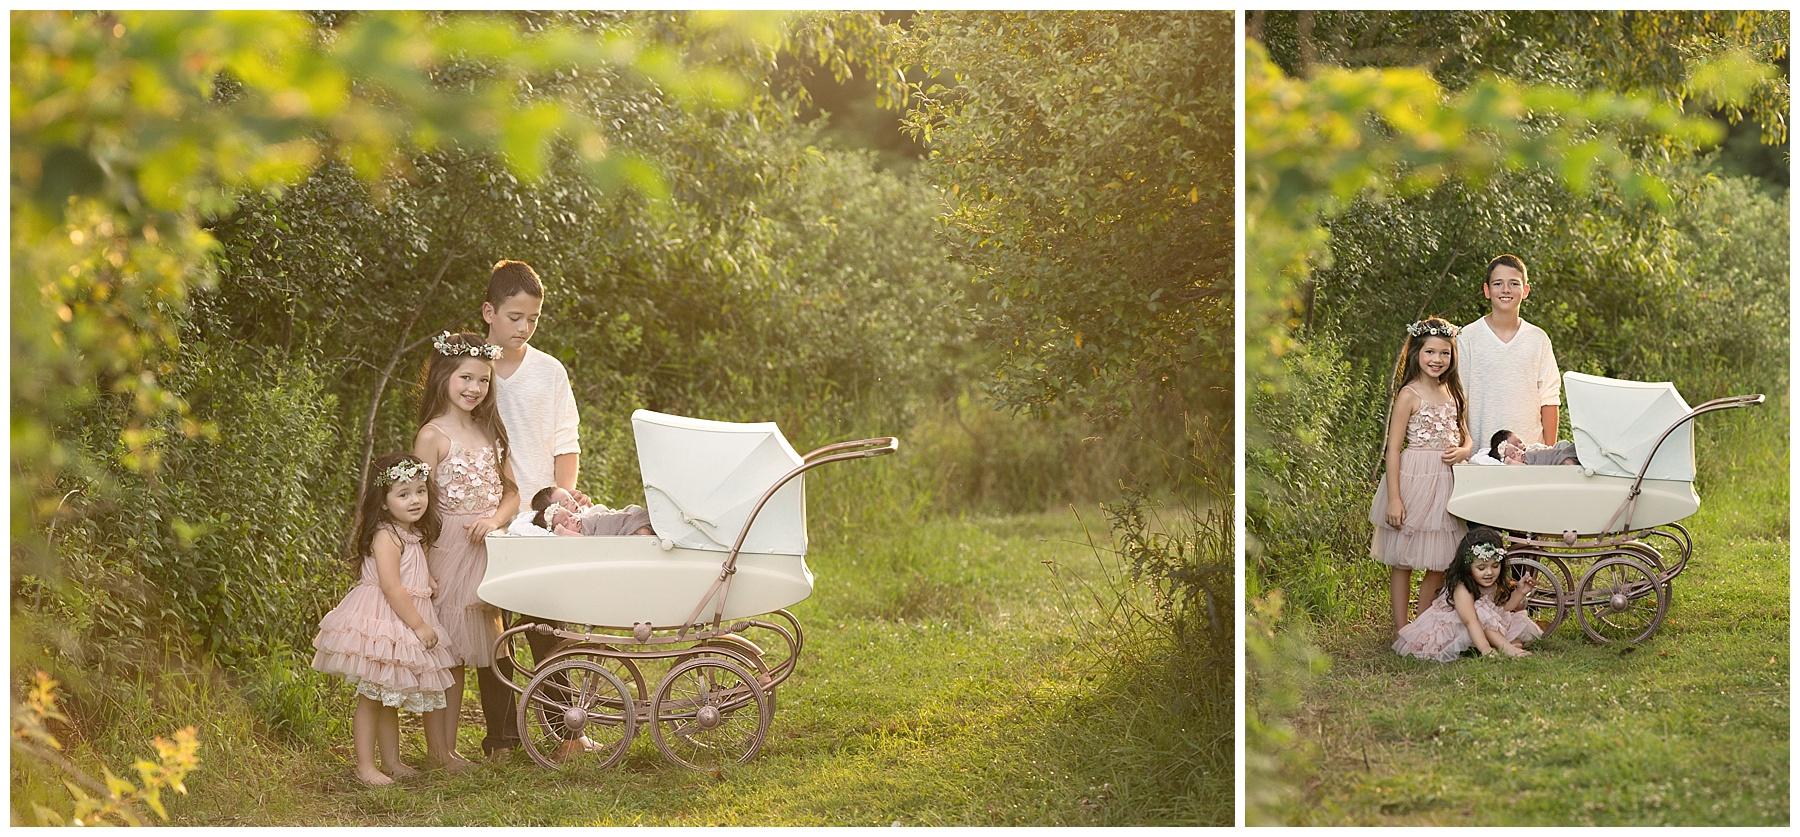 <Rose gold vintage carriage , golden hour, children posing, whimsical , pamela salai photography >